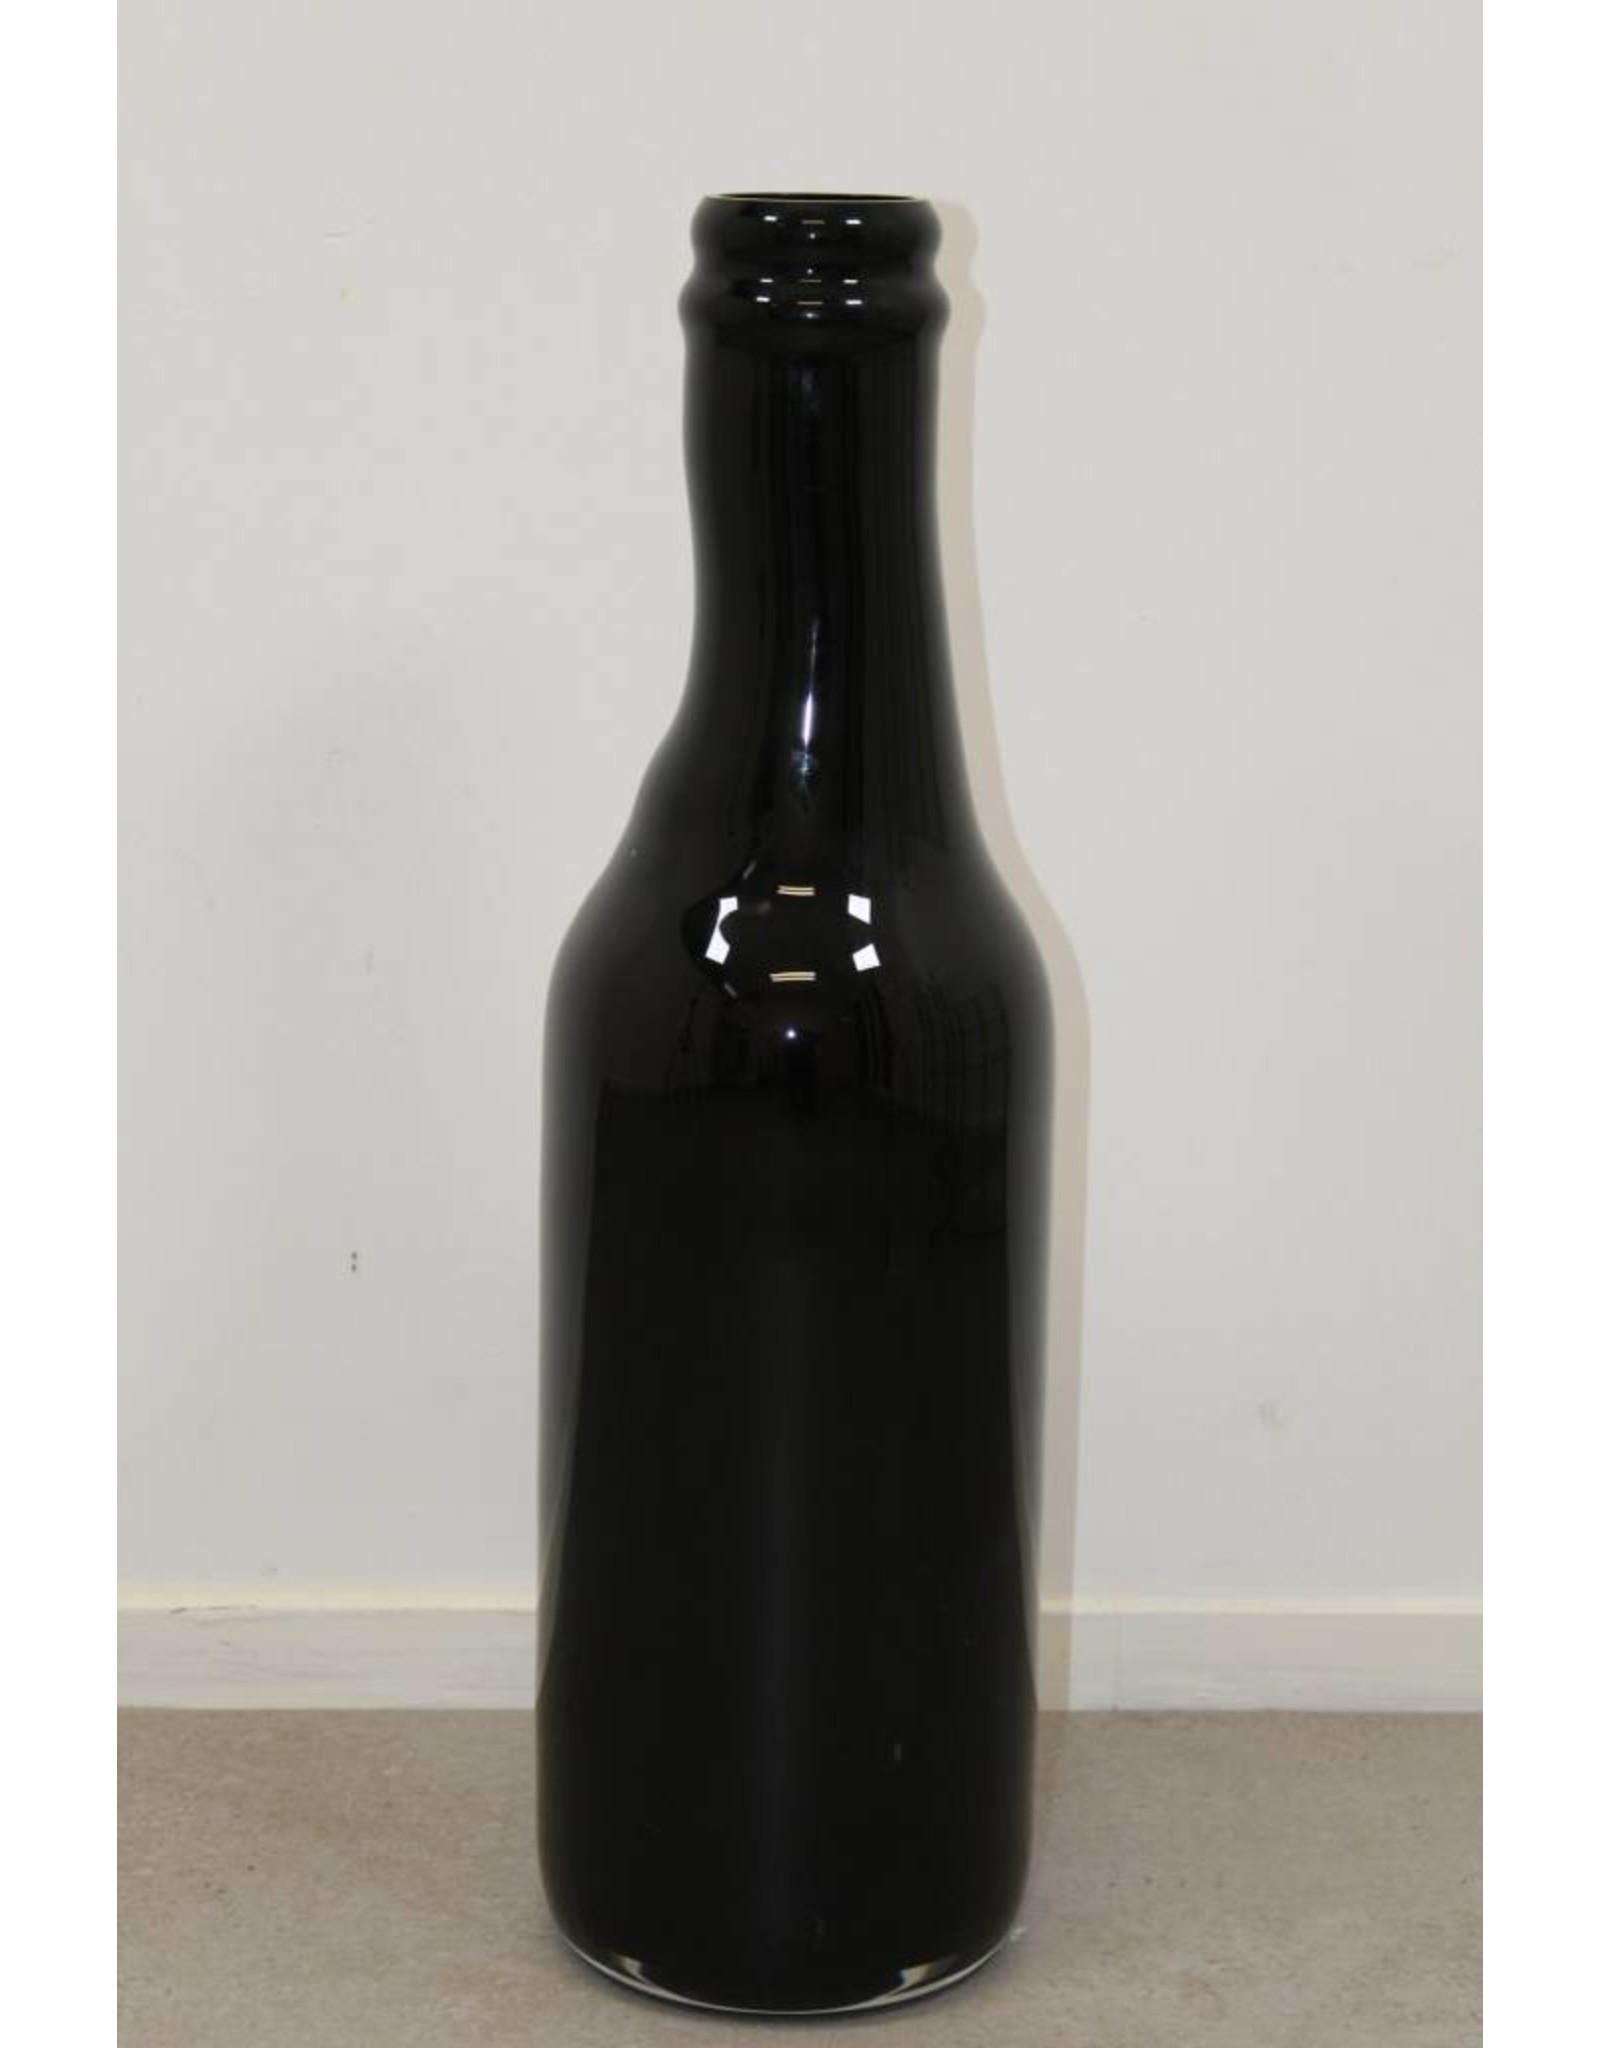 Zwarte fles Royal Leerdam A37 Unica Strabelle